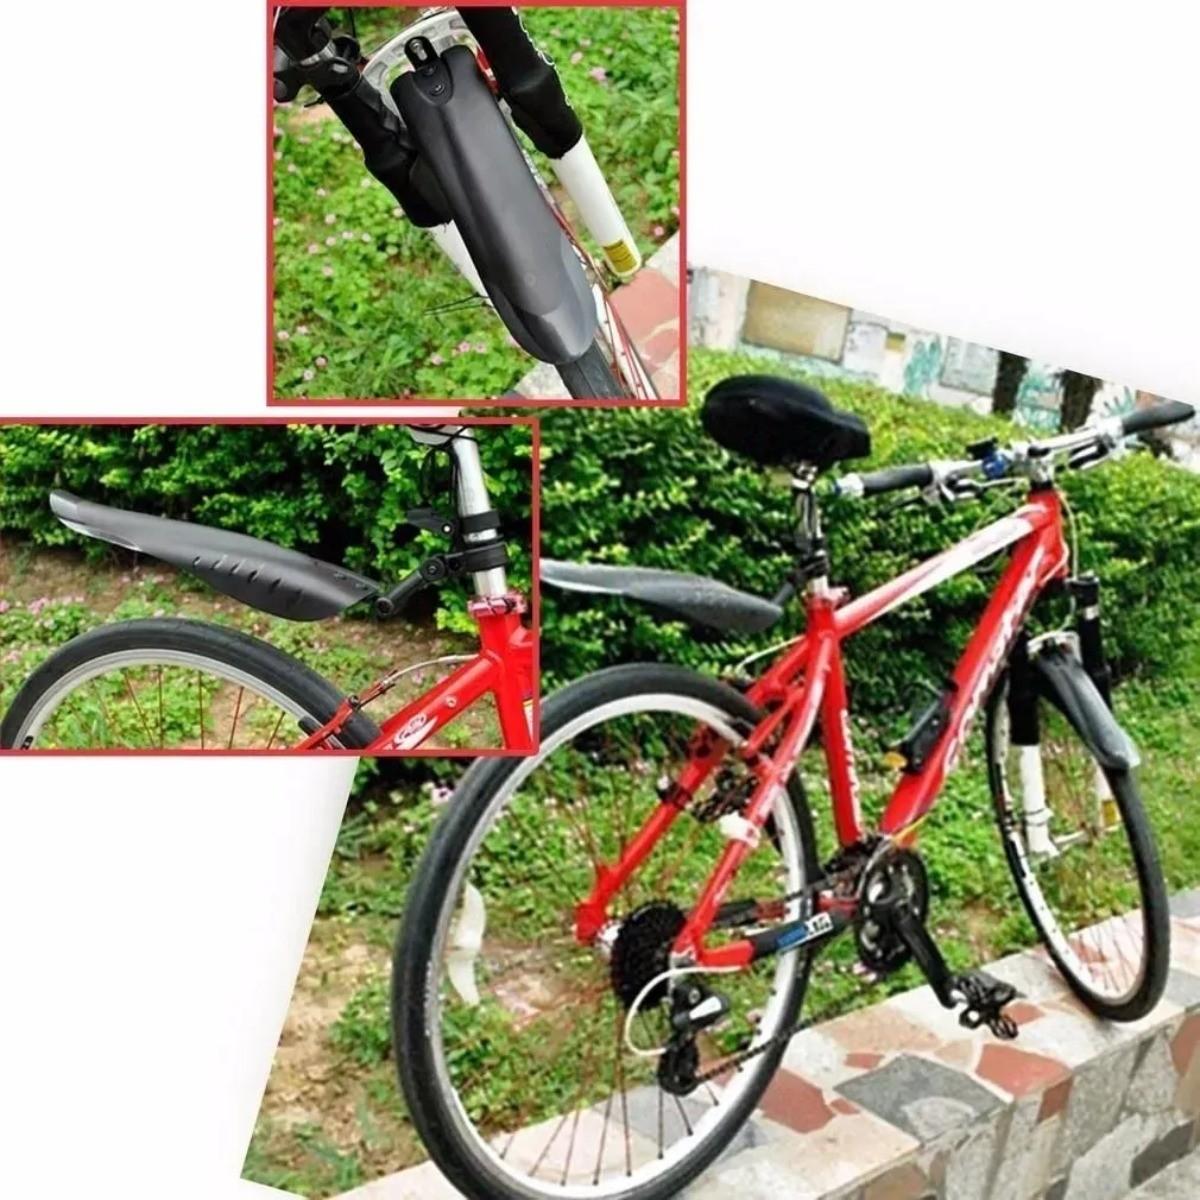 Paralama H1680 Bicicleta Ciclismo Preto Nylon Mtb Dianteiro e Traseiro